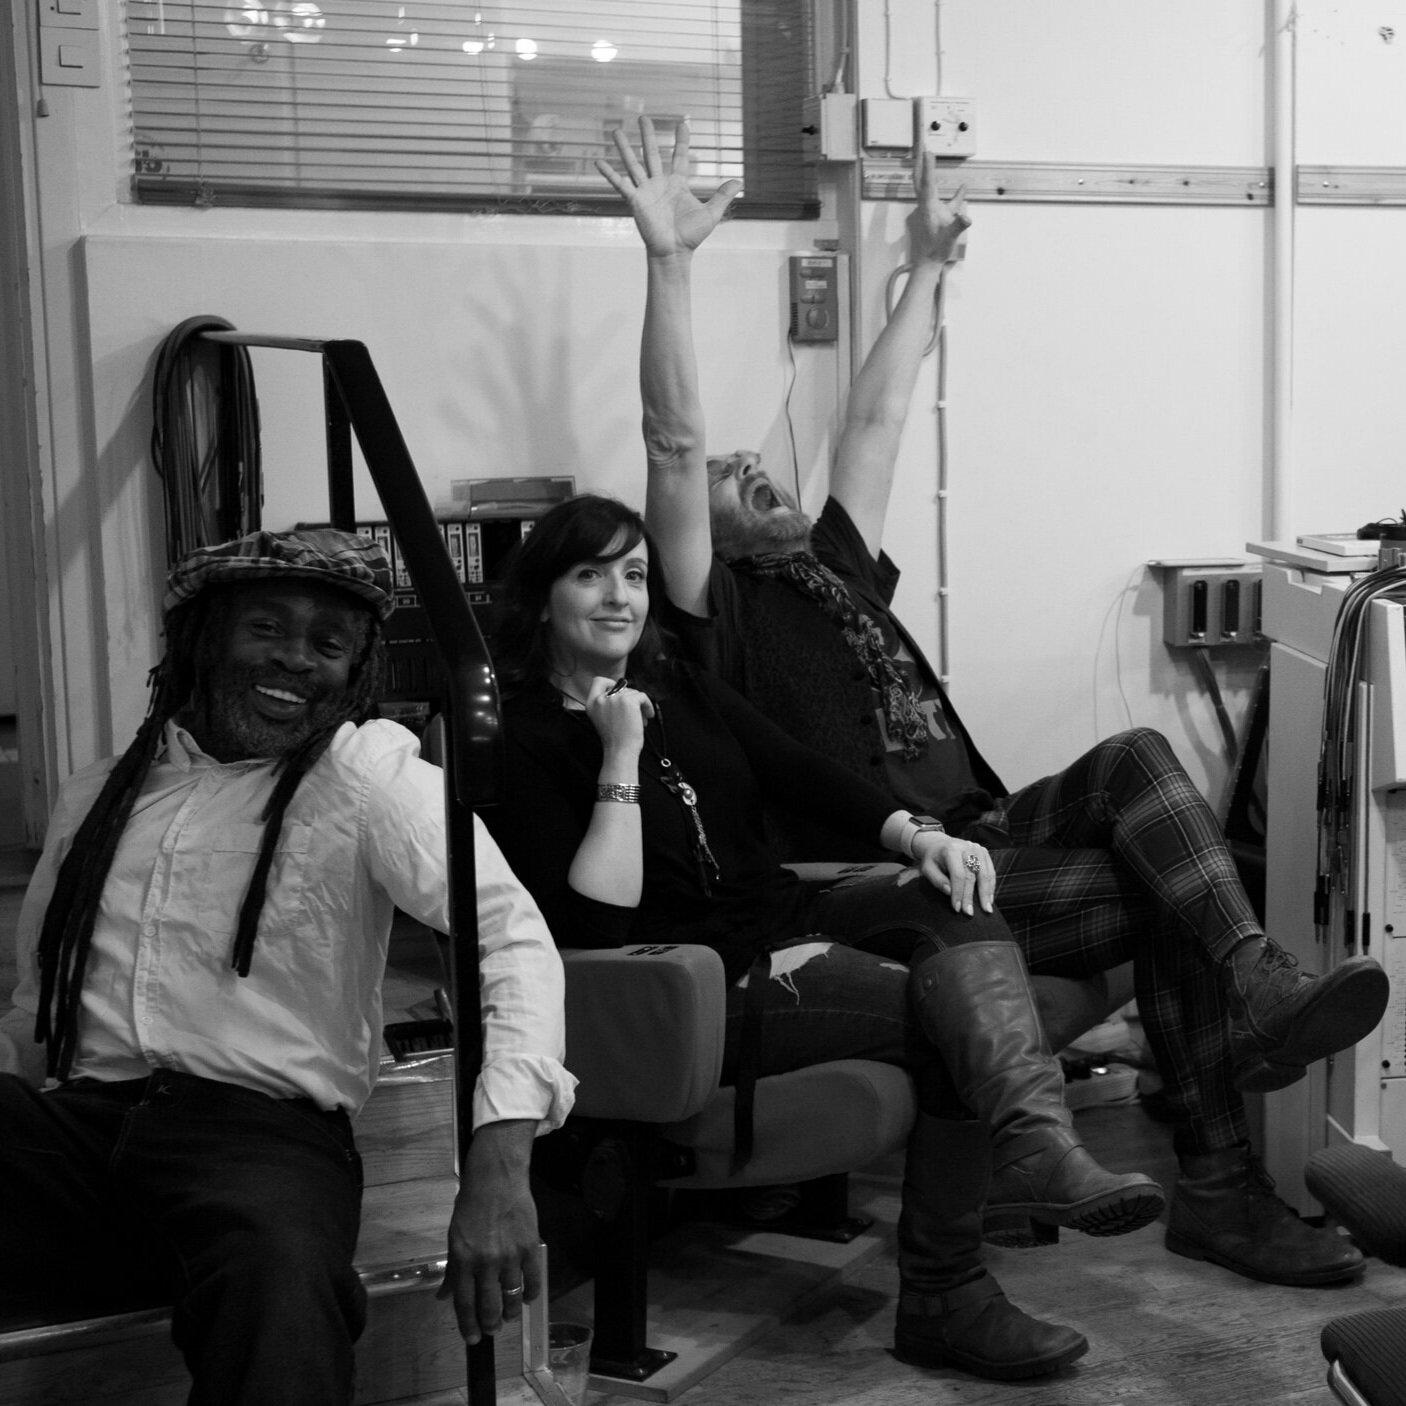 Desmond Foster, Anna Brooks and Lati Kronlund at Atlantis Studios.